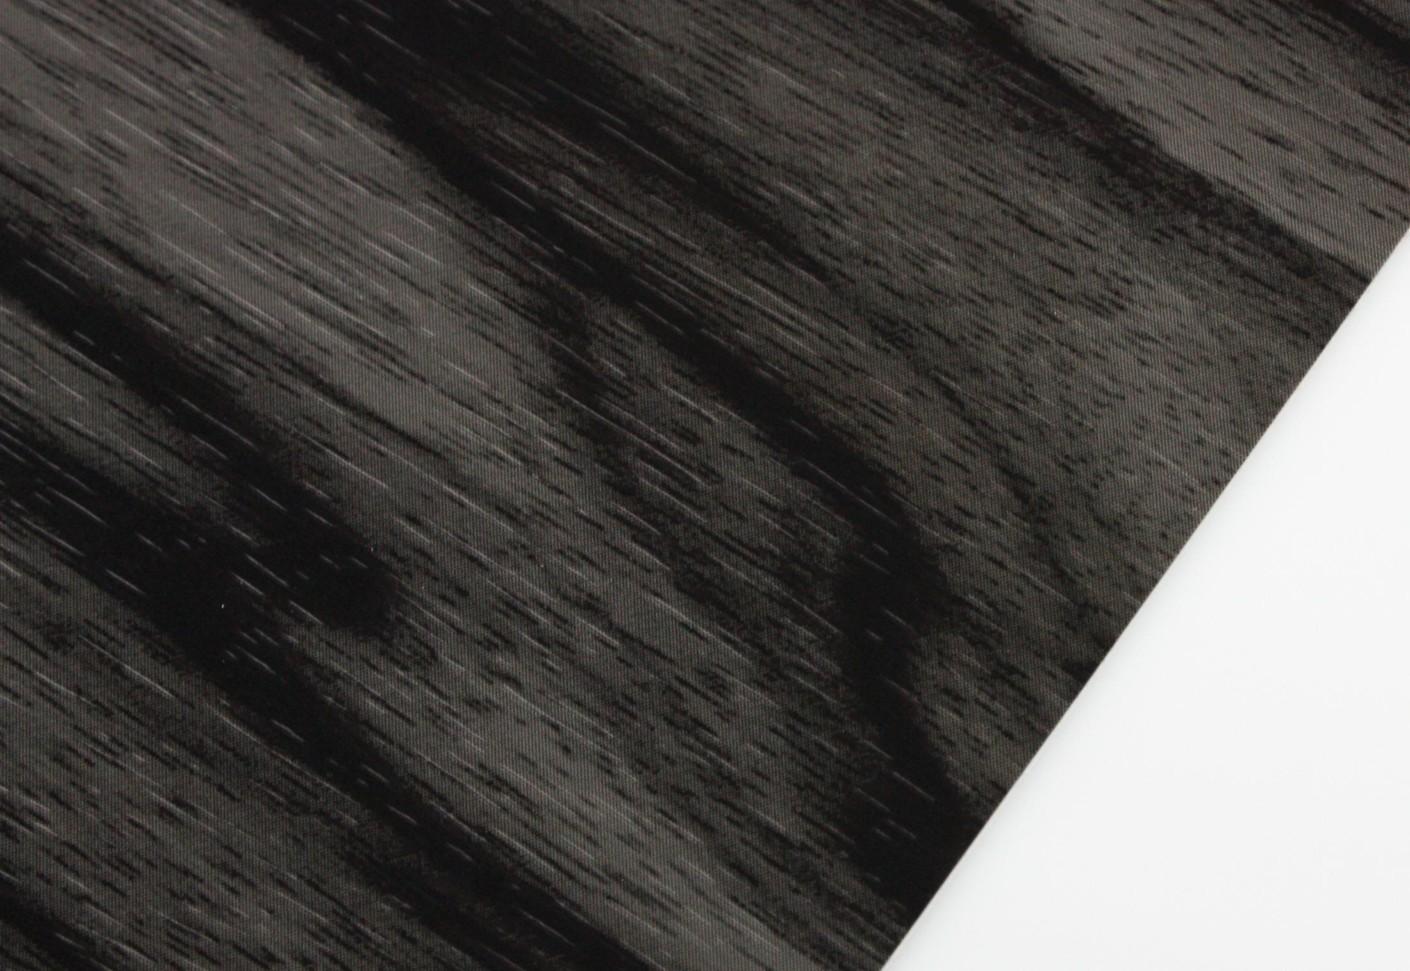 di noc wood grain by 3m stylepark. Black Bedroom Furniture Sets. Home Design Ideas